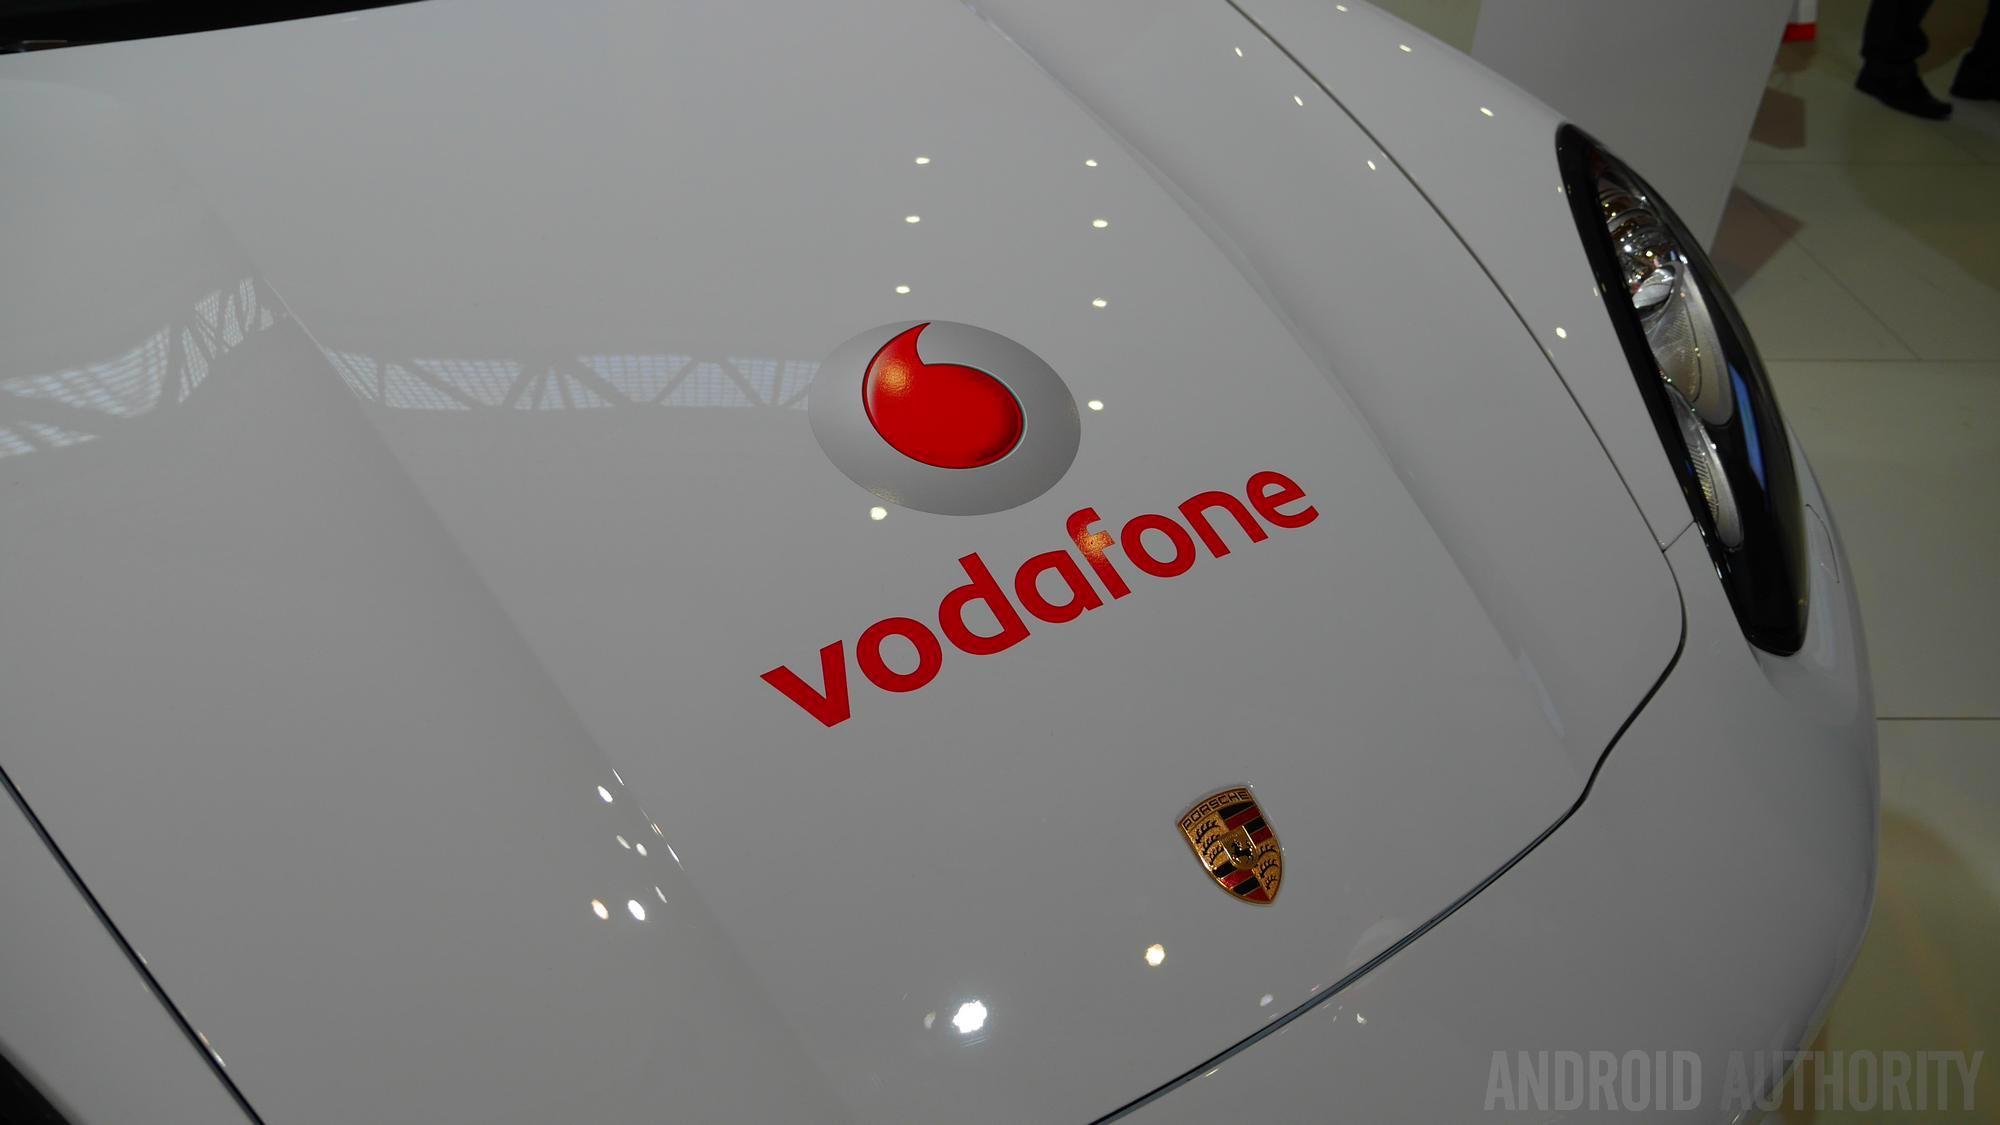 vodafone logo mwc 2015  s